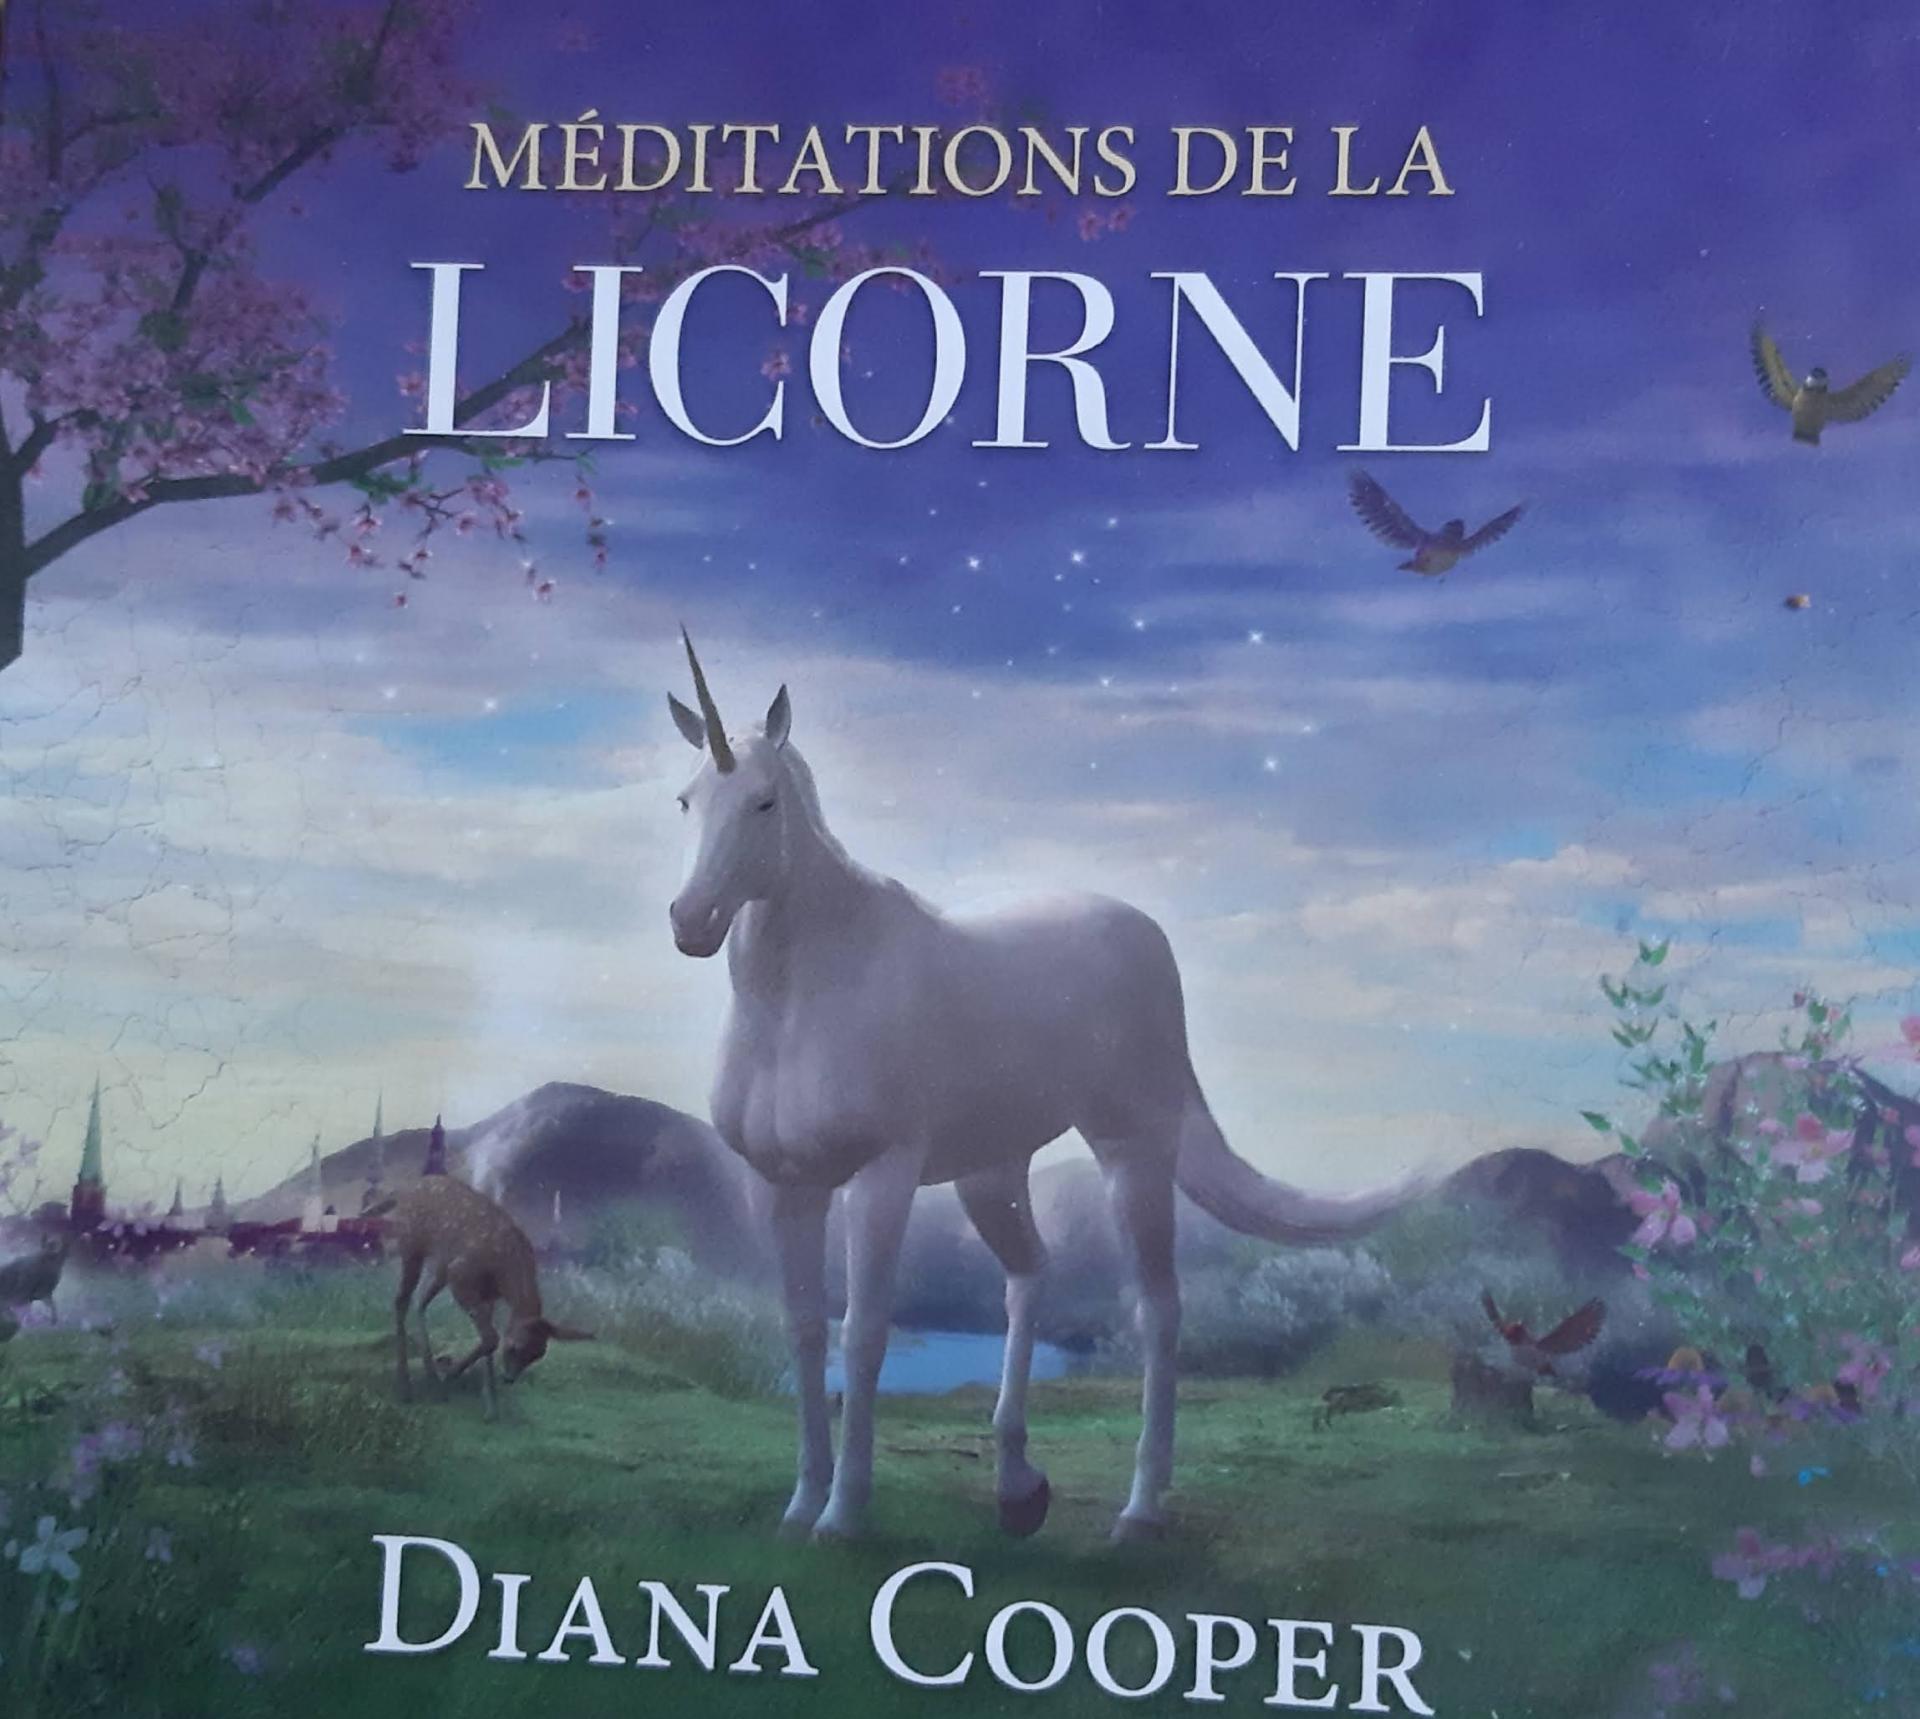 MEDITATION DE LA LICORNE DIANA COOPER